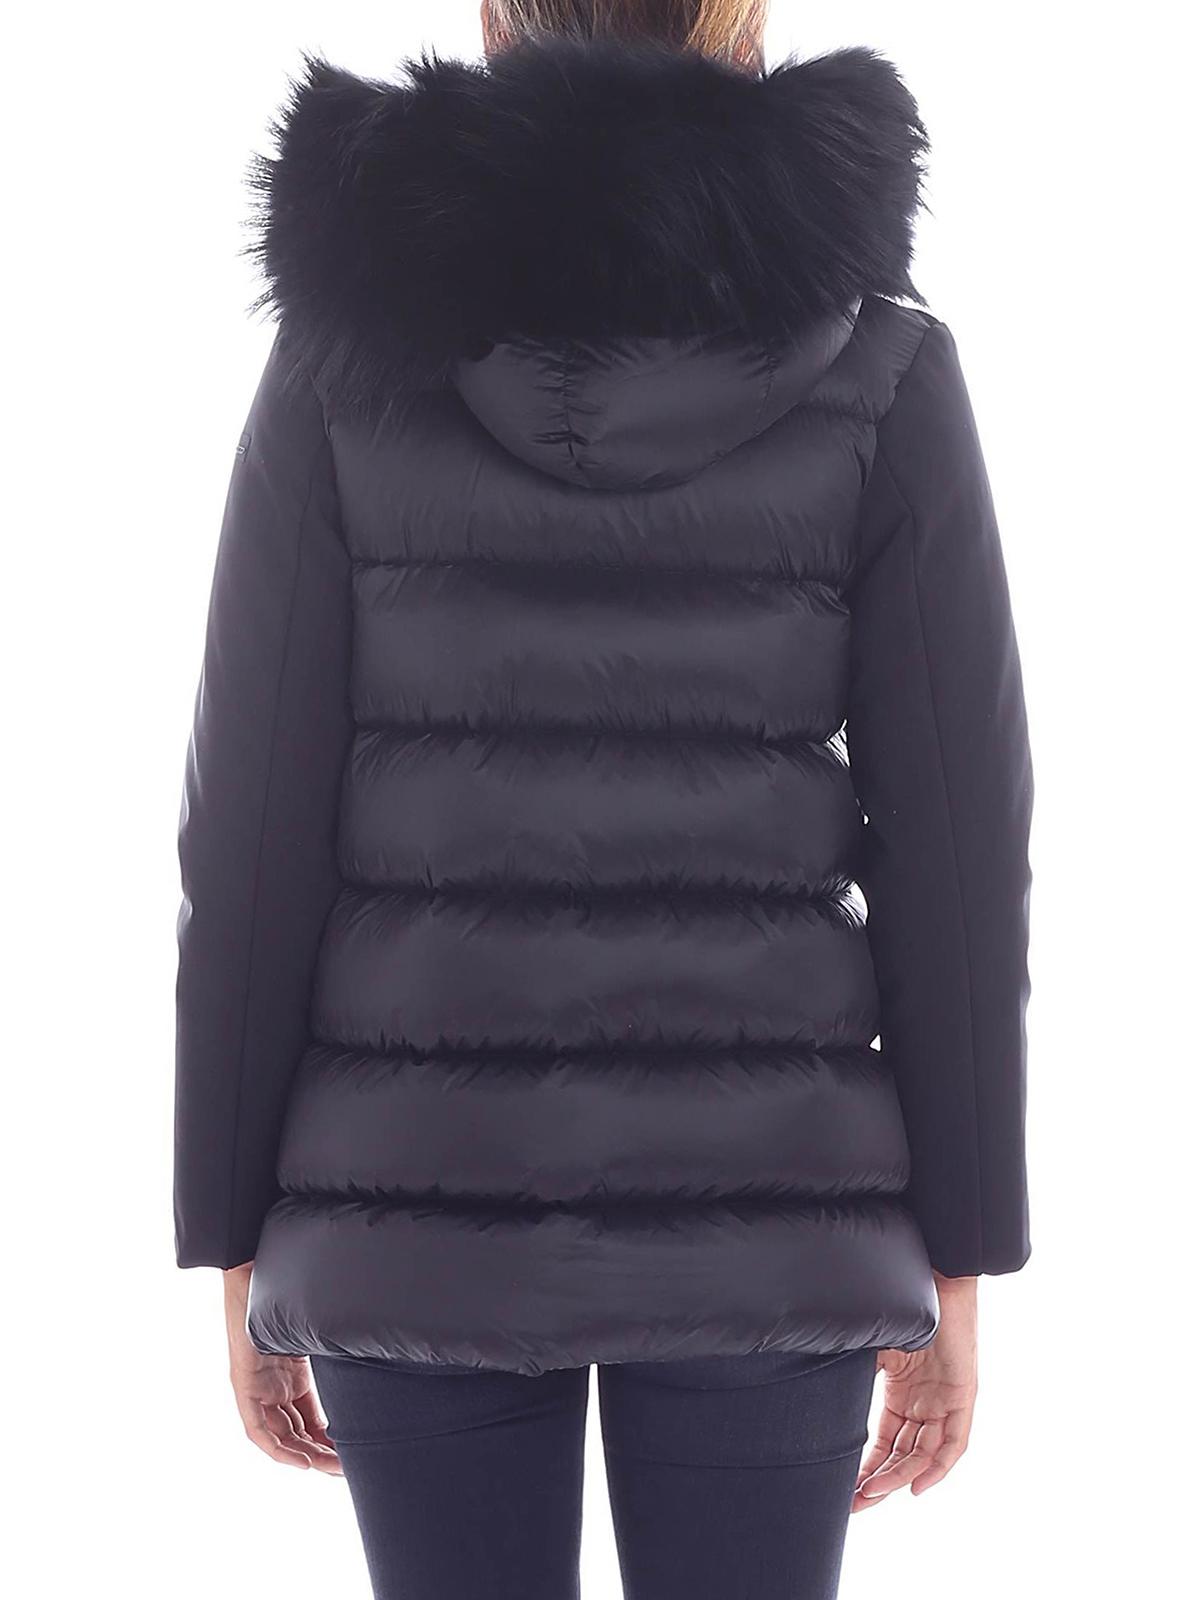 Rrd - Winter Hybrid Zar Lady Fur Black Nylon Jacket -4817